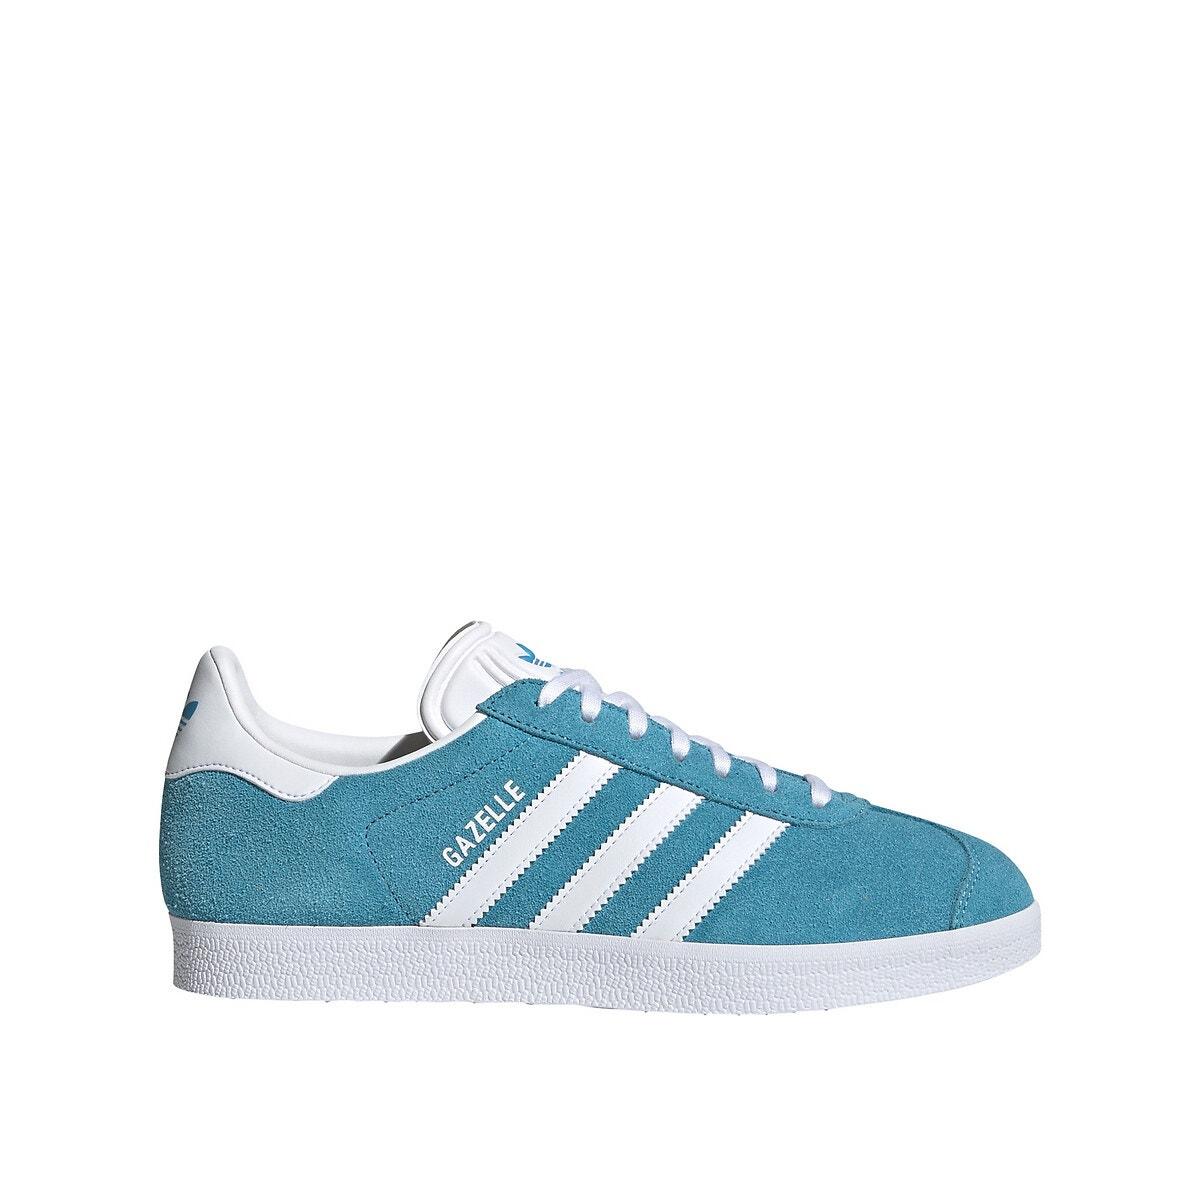 Adidas gazelle bleu | La Redoute